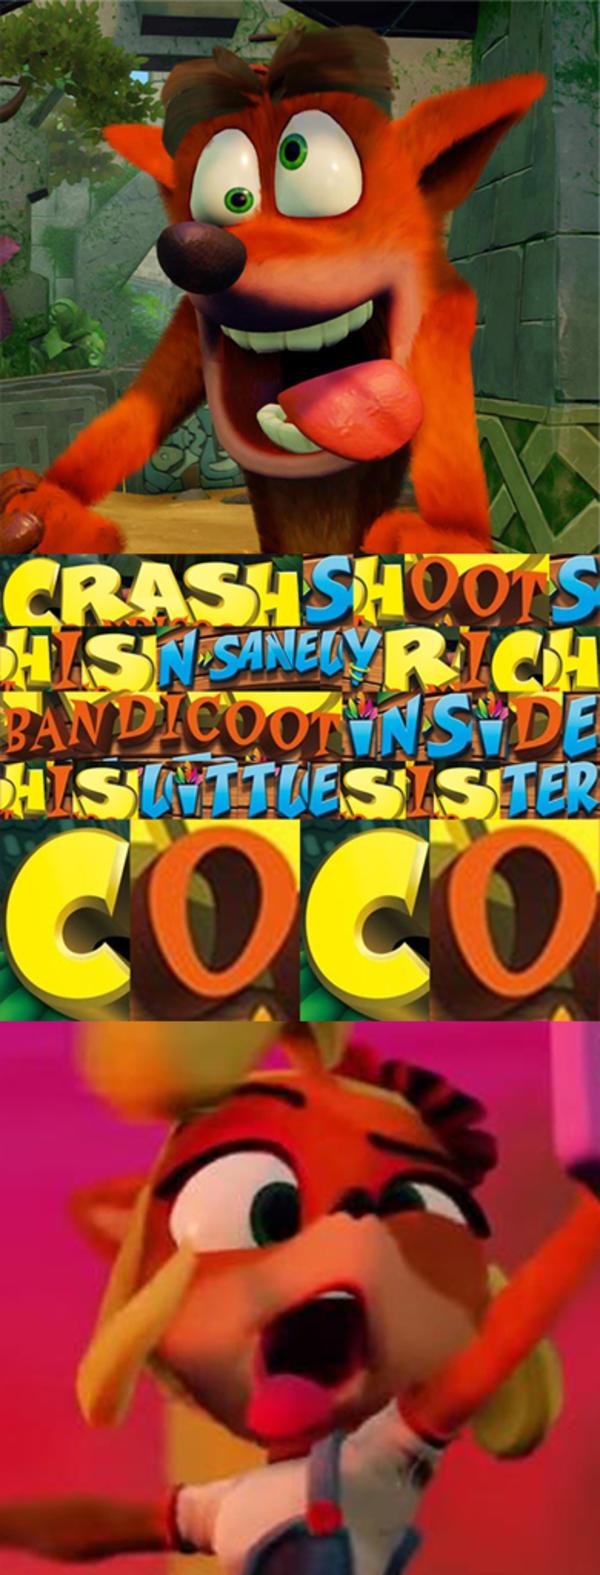 Hot, sticky bandicoot | Crash Bandicoot | Know Your Meme